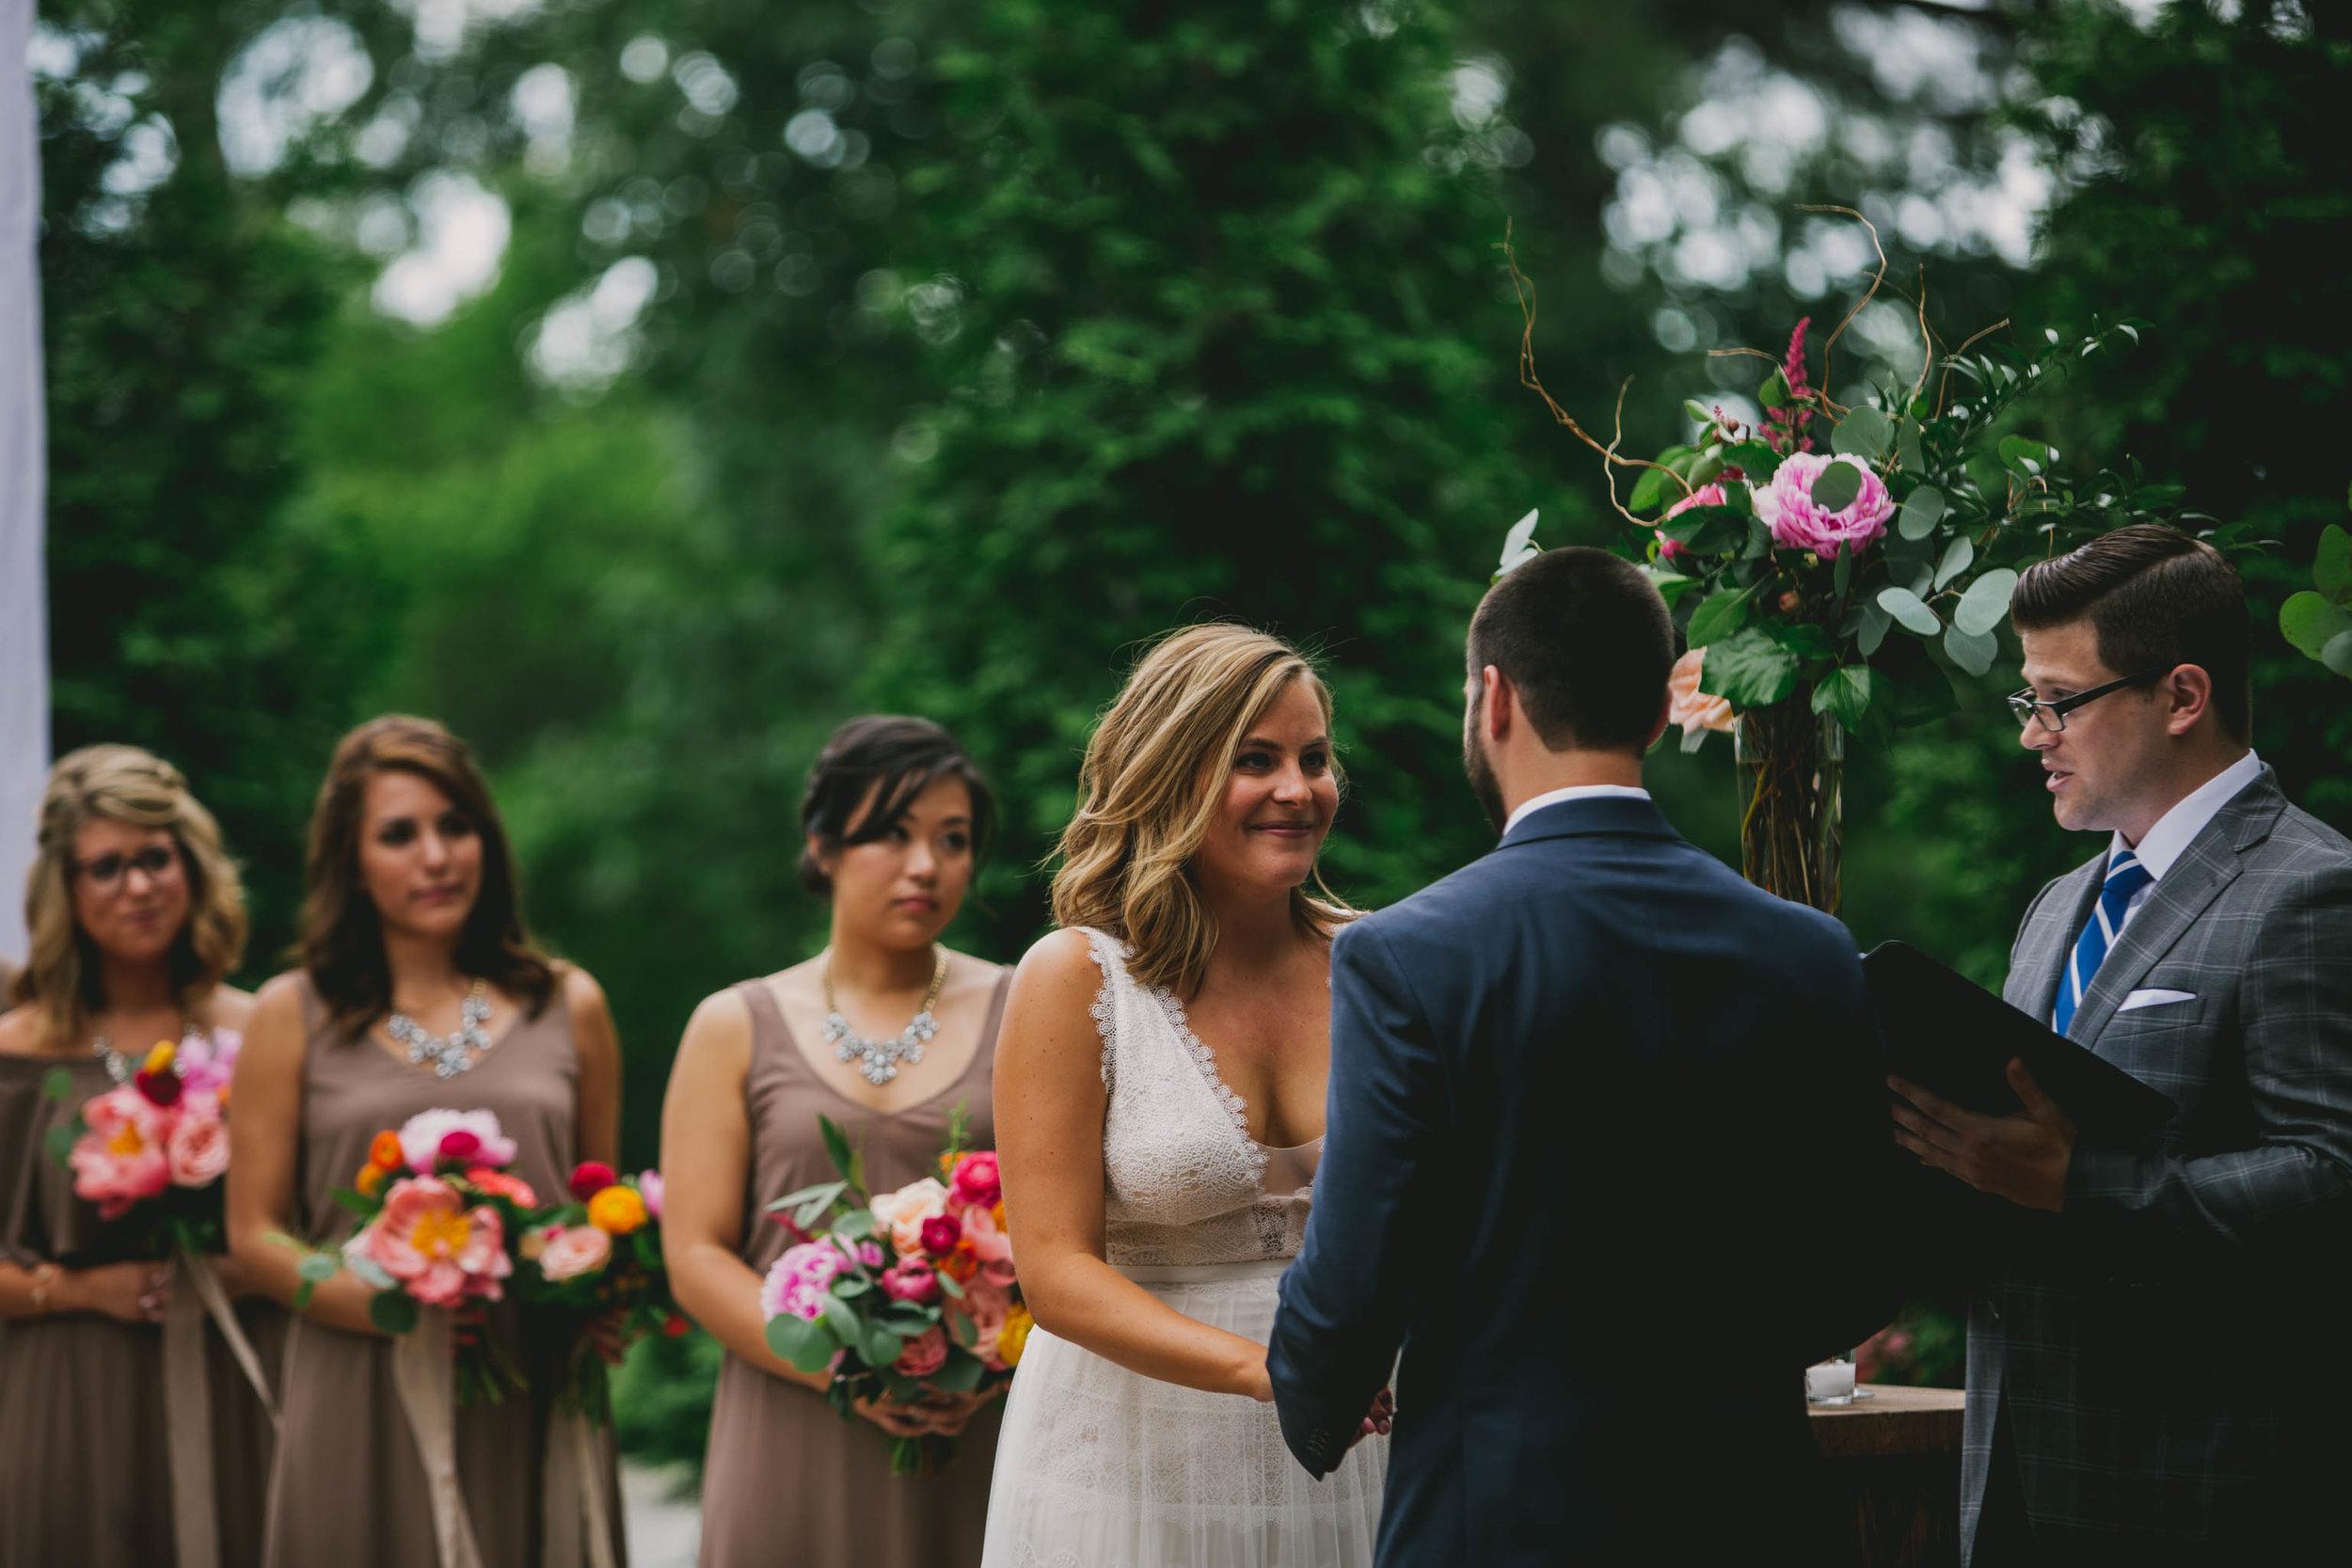 mims-house-wedding-ceremony-photo.jpg